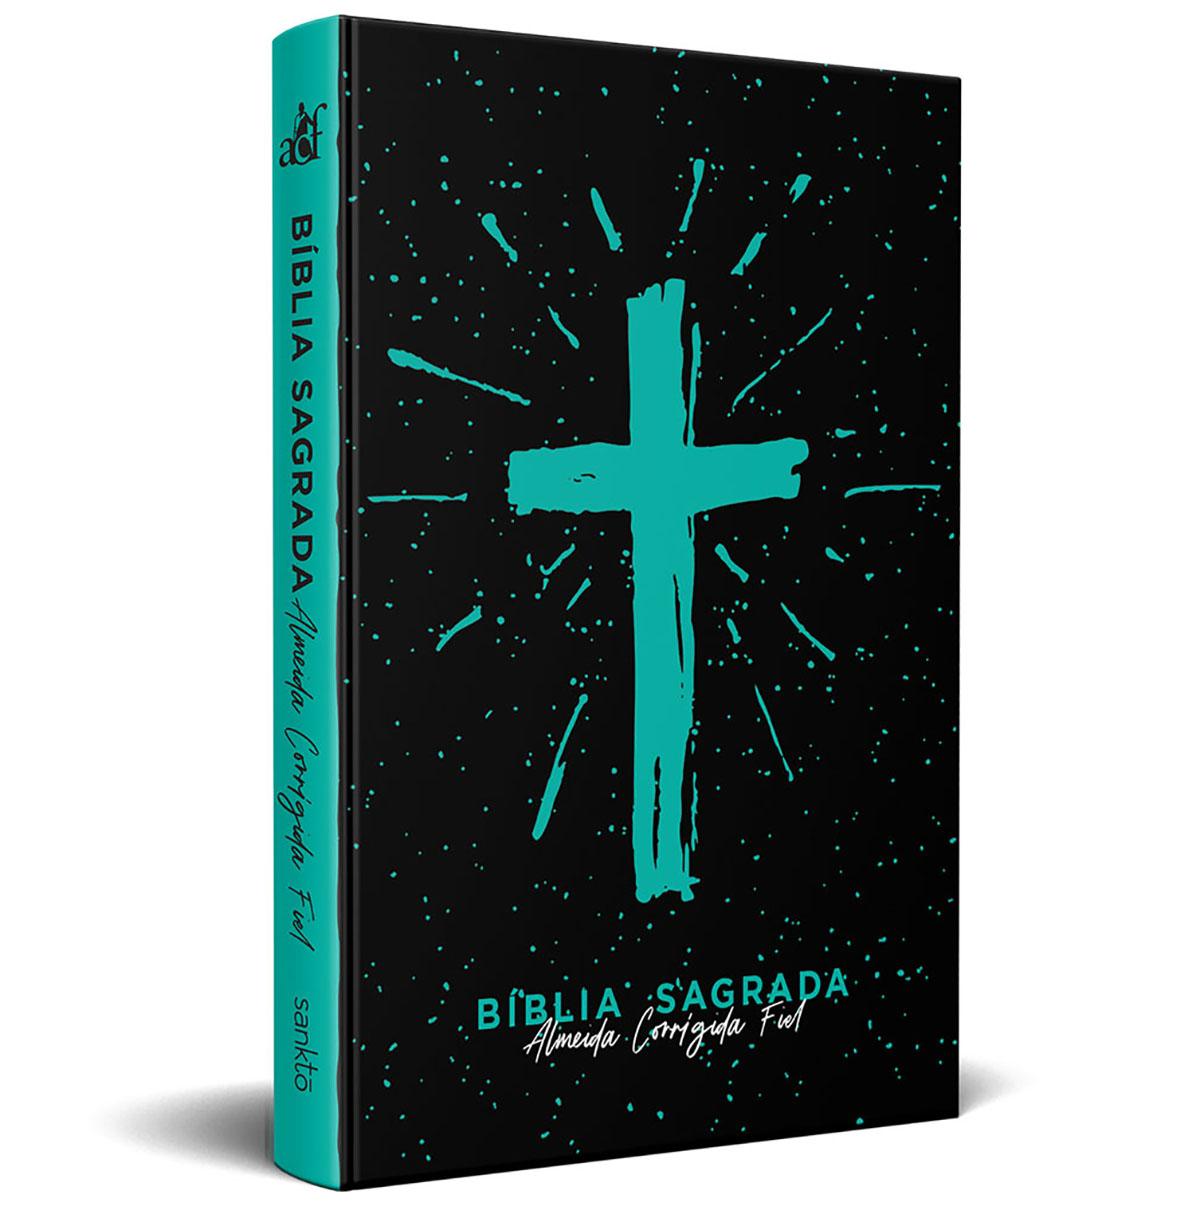 Bíblia ACF Slim 760 Cruz Tiffany - 7908249102529